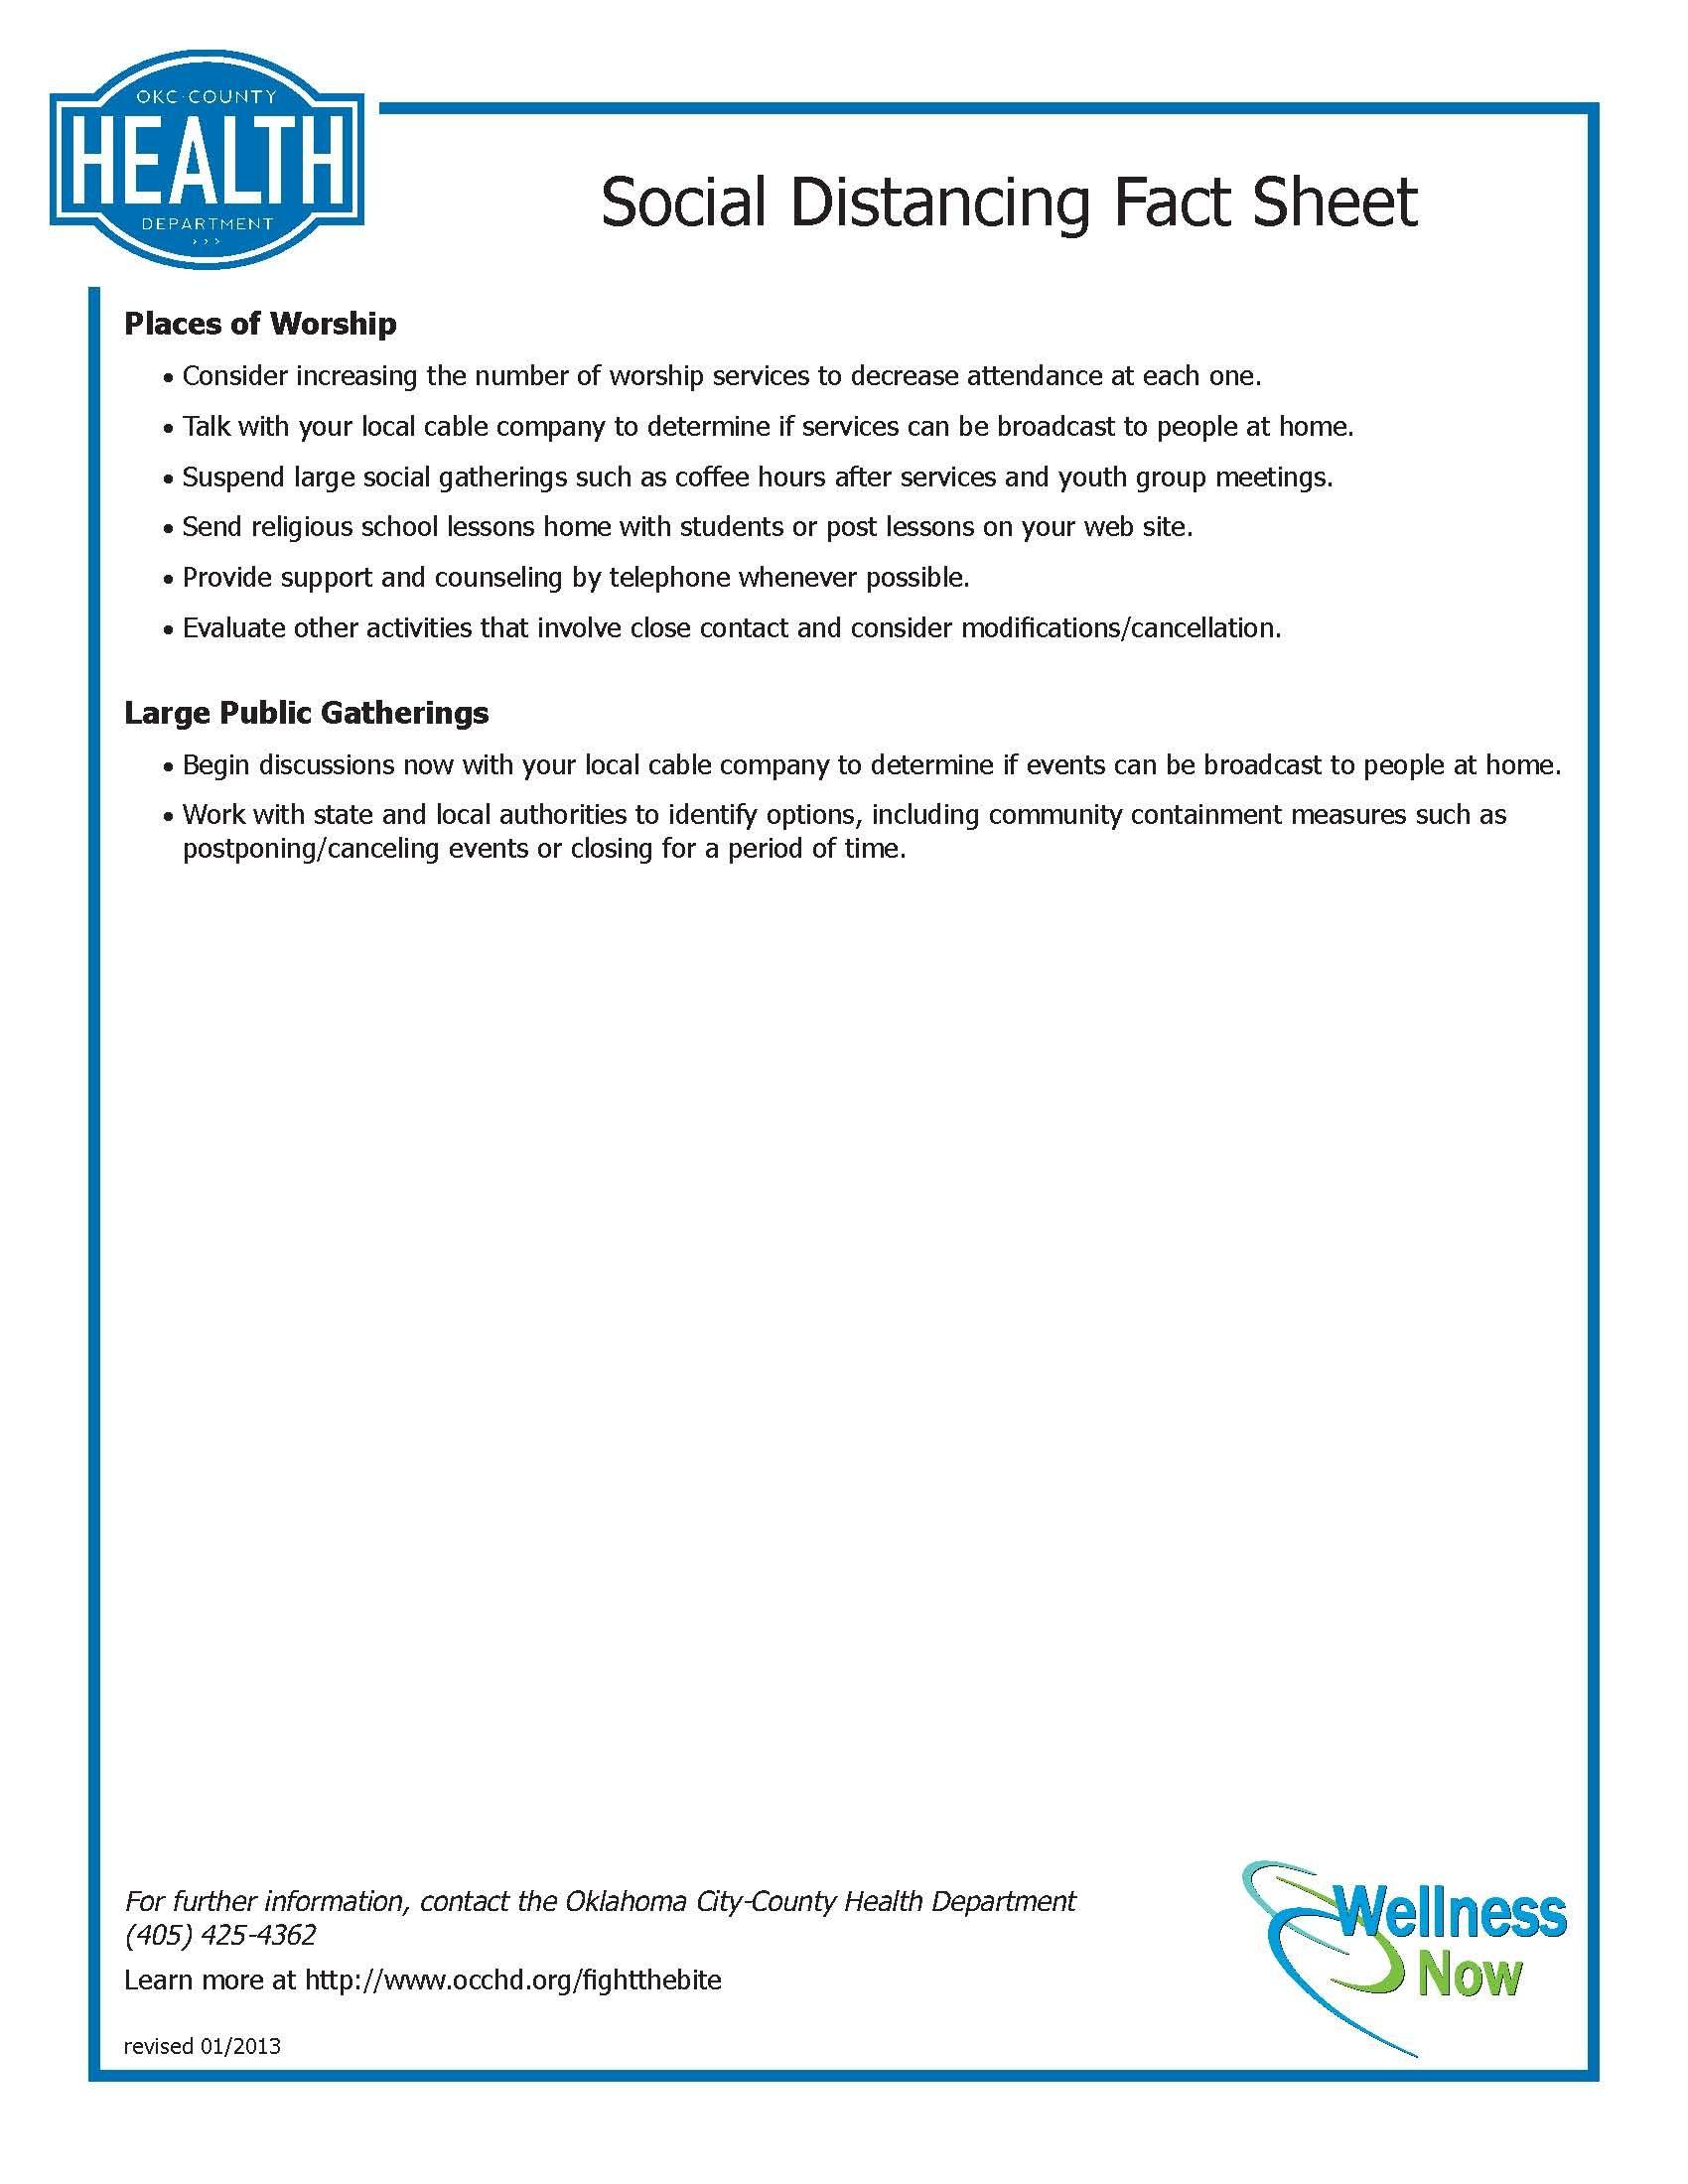 Social Distancing Part 2 Fact Sheet